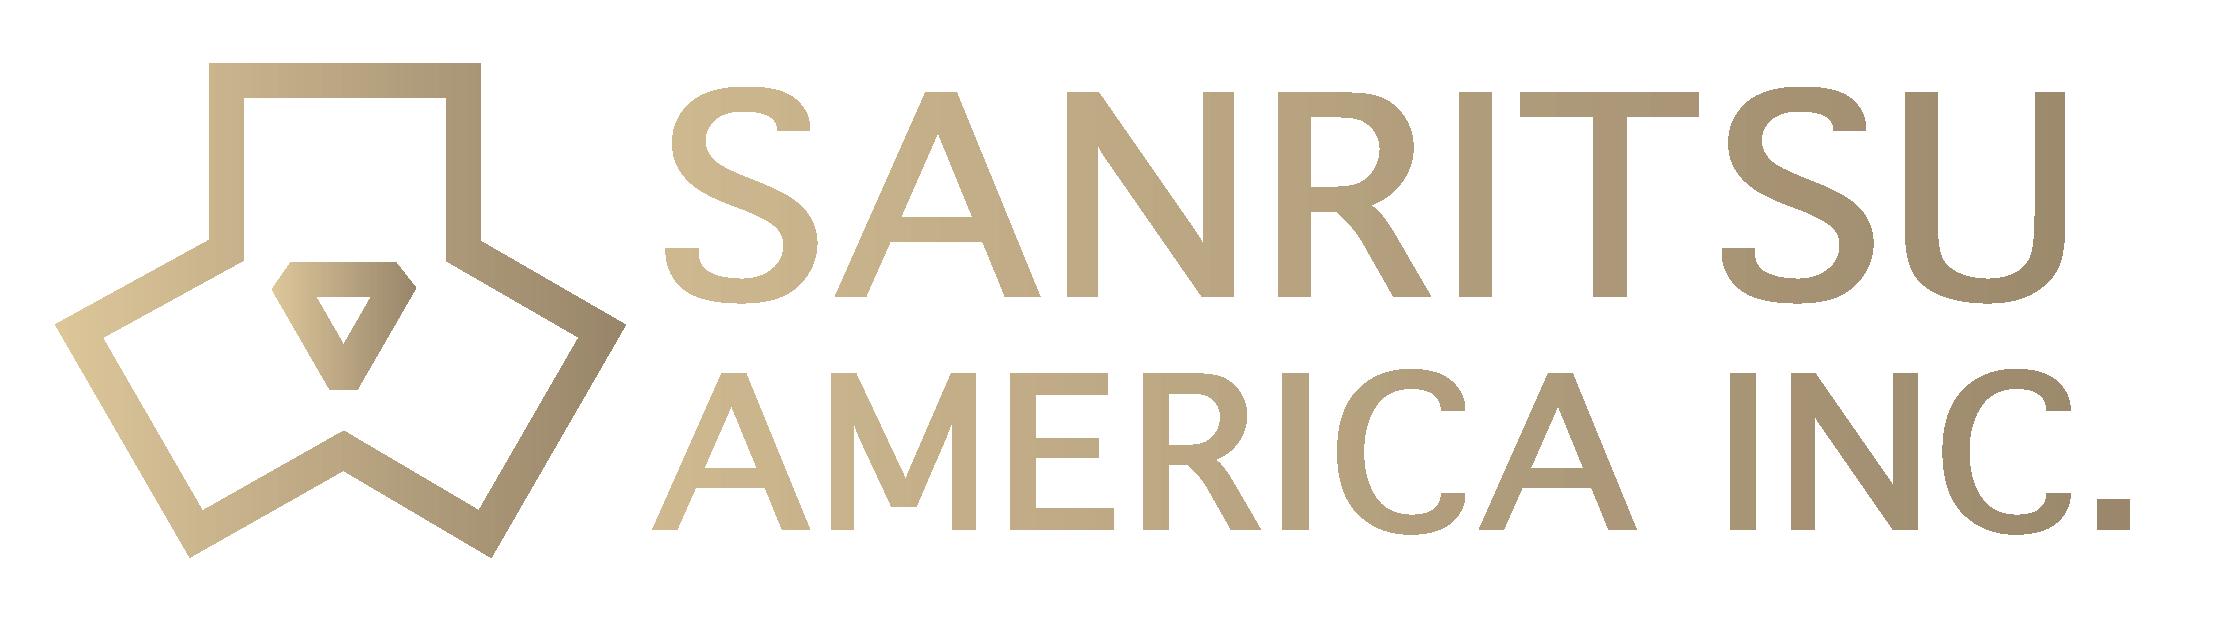 Sanritsu America, Inc